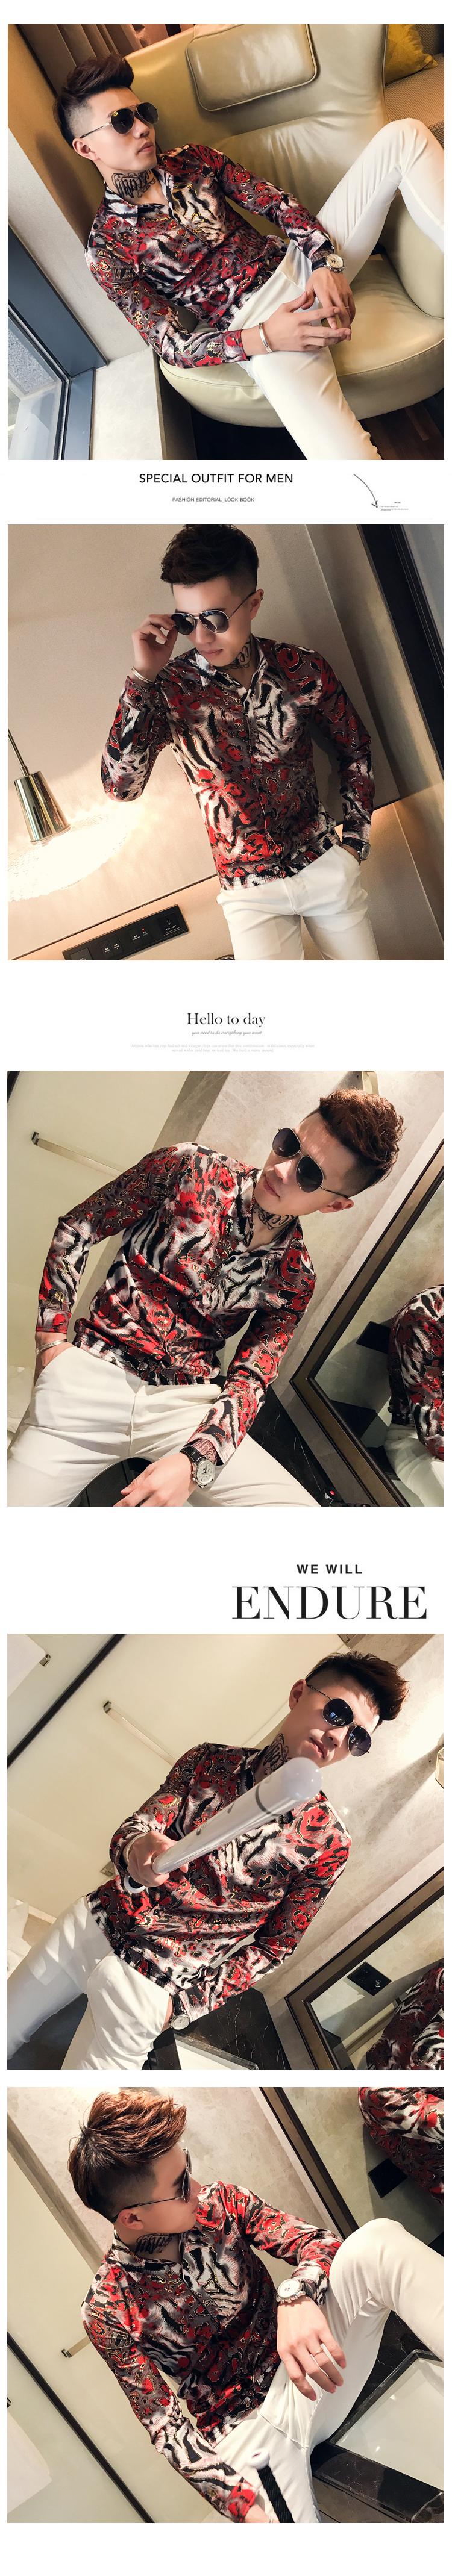 Bronzing Shirts Mens Social Club Outfits Slim Fit Fashion Men Shirts 2019 Korea Mens Casual Clothing Floral Printed Shirts 9